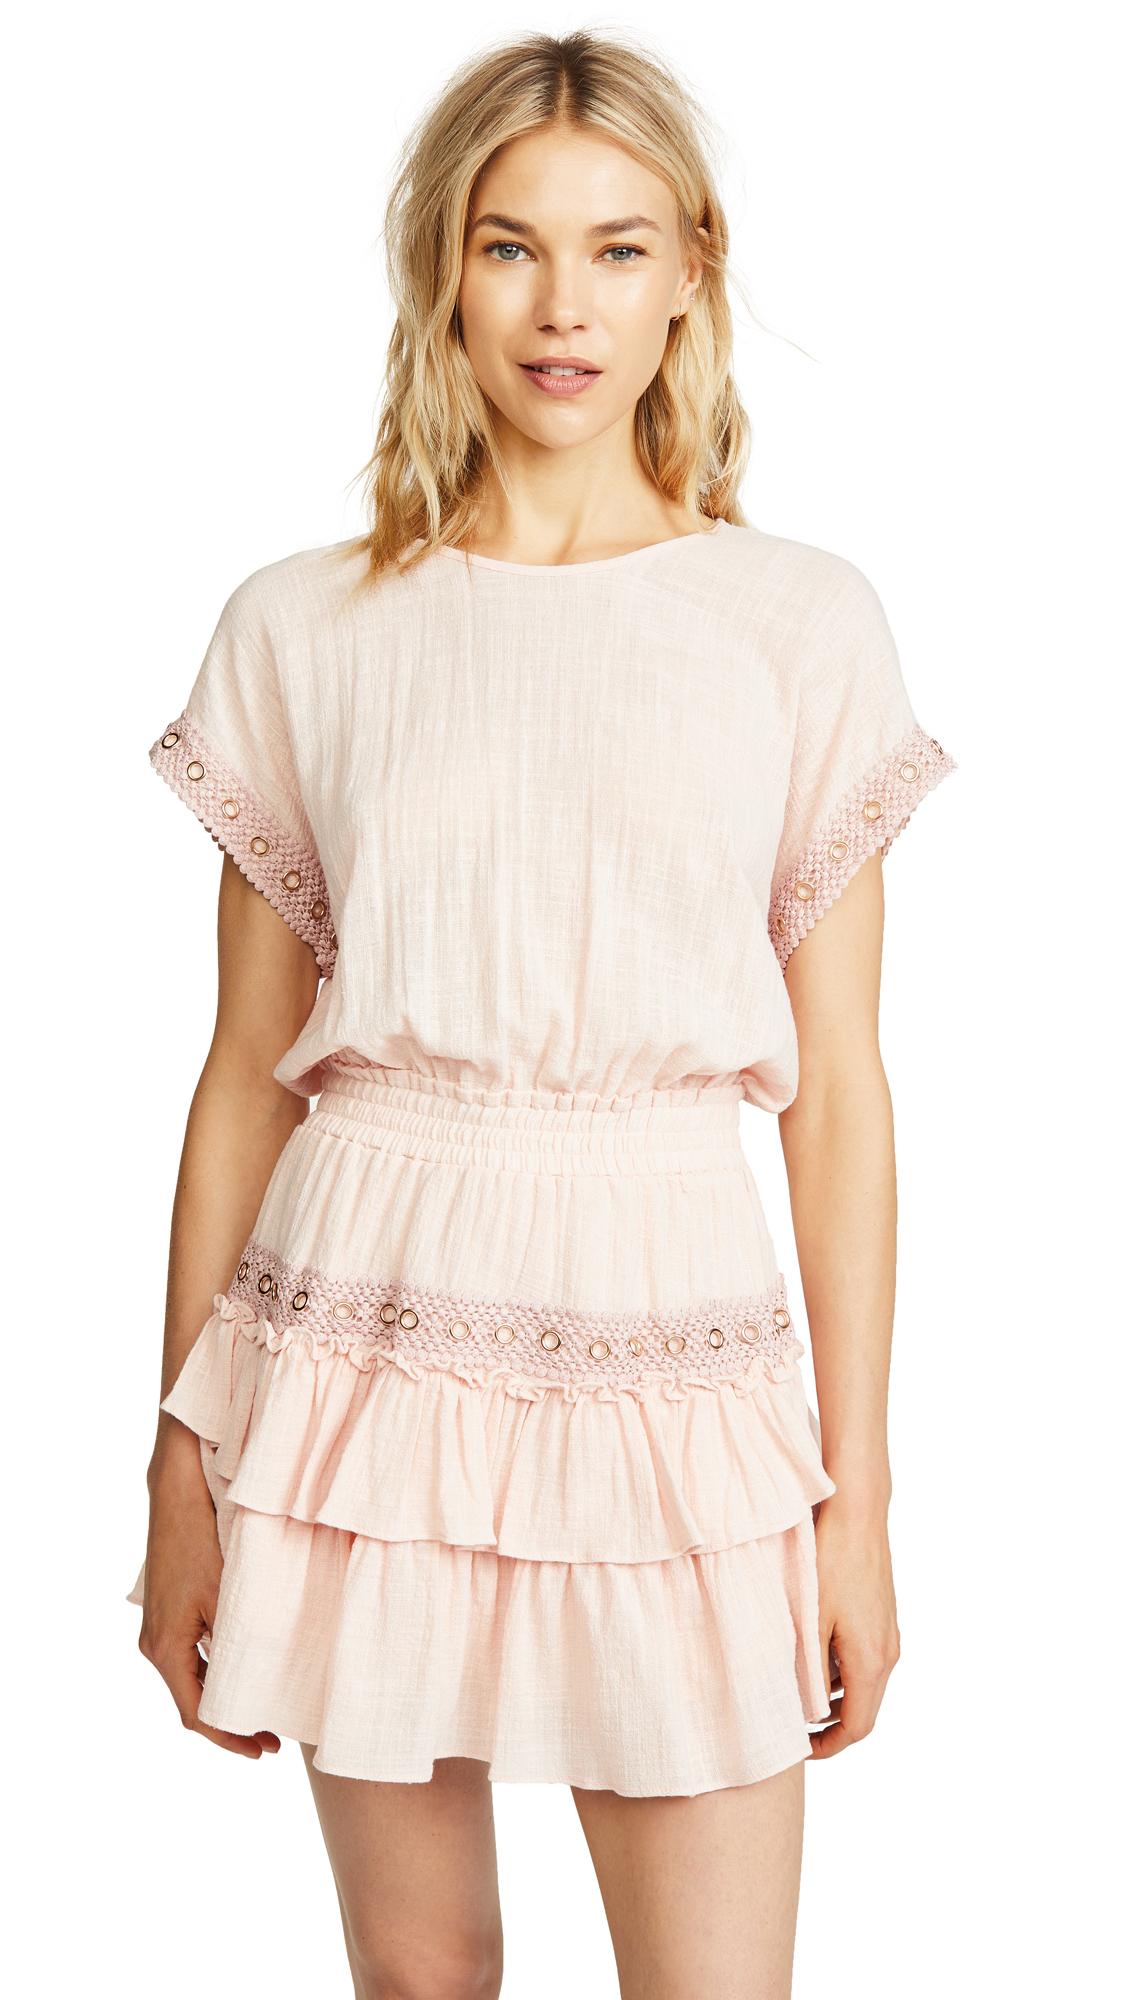 MISA Olivia Dress In Pink